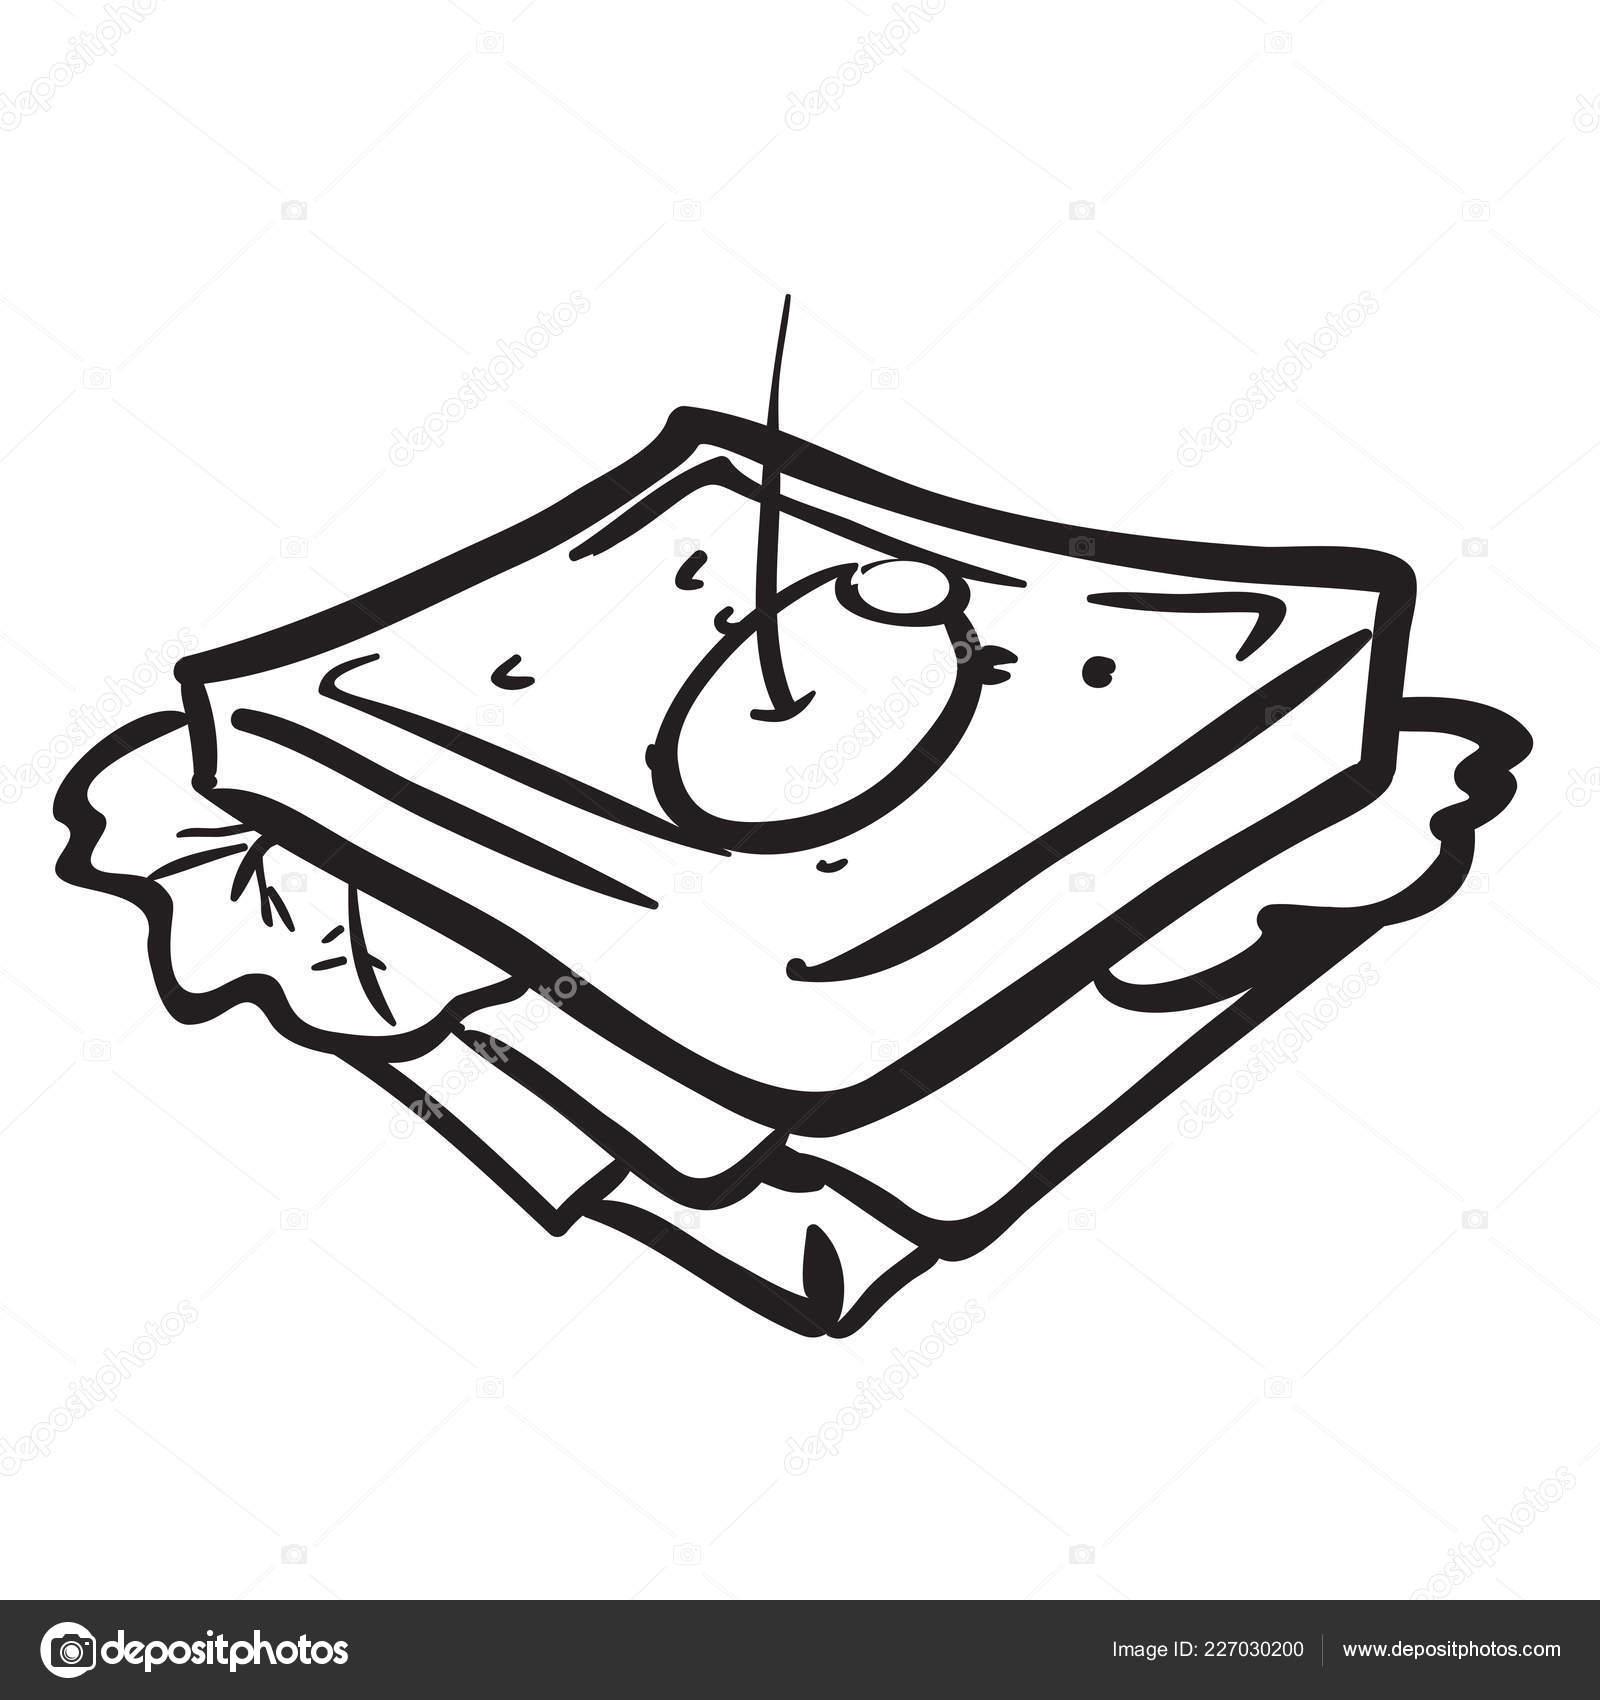 black white sandwich cartoon illustration stock vector c ainsel 227030200 depositphotos